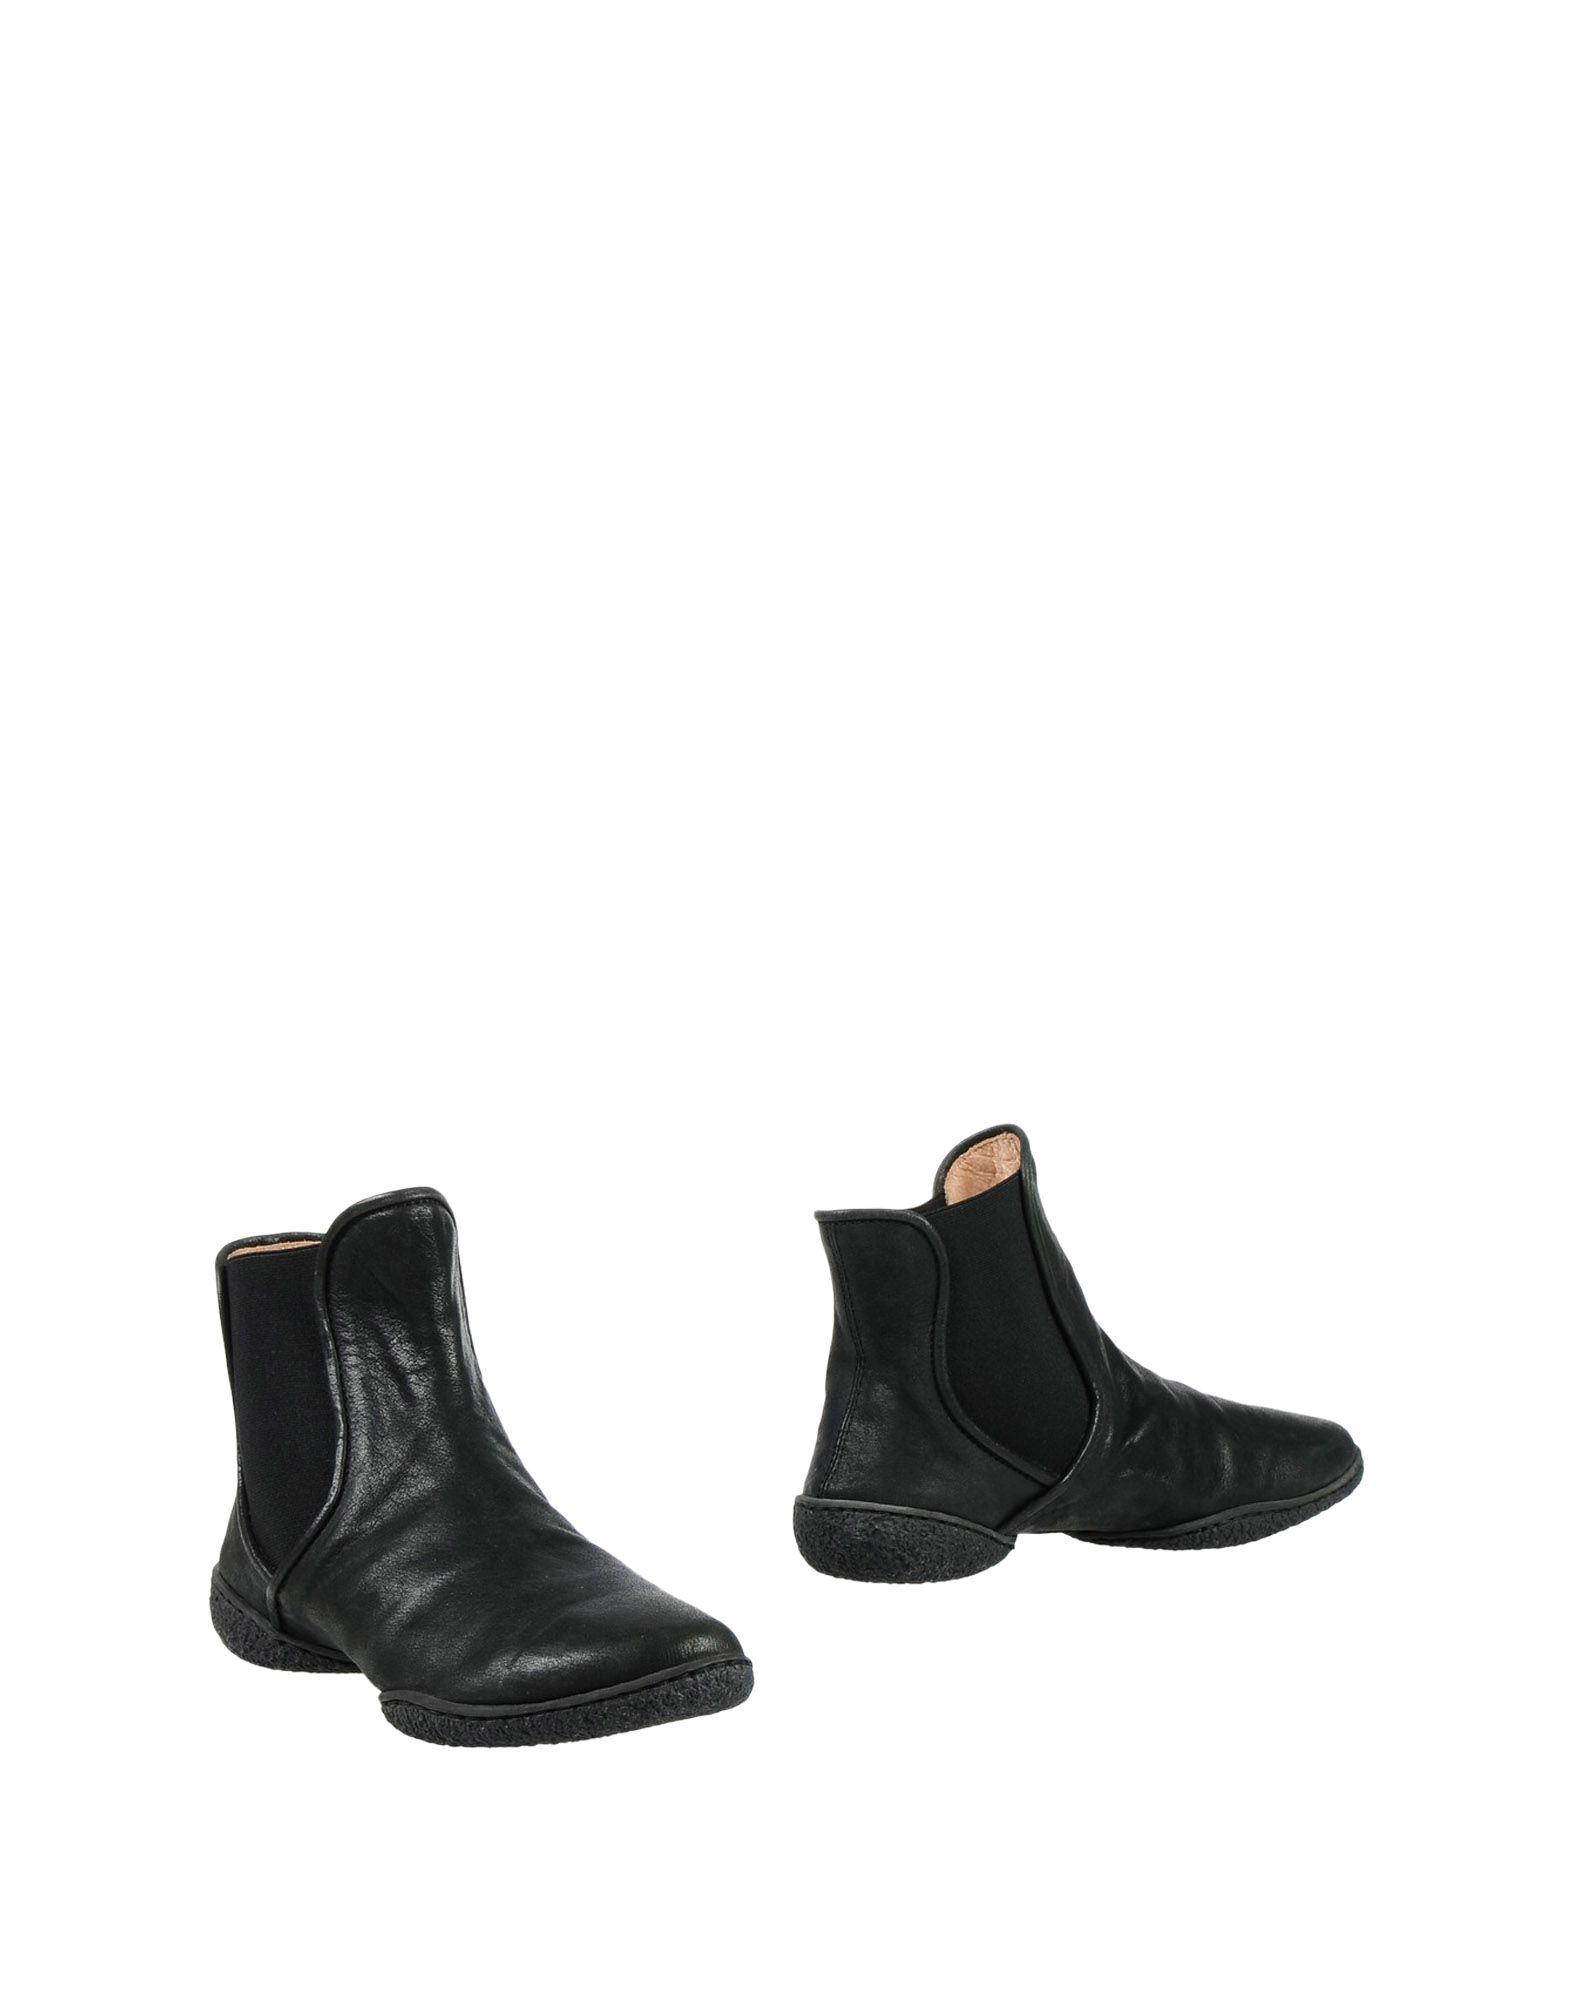 TRIPPEN Полусапоги и высокие ботинки george j love полусапоги и высокие ботинки